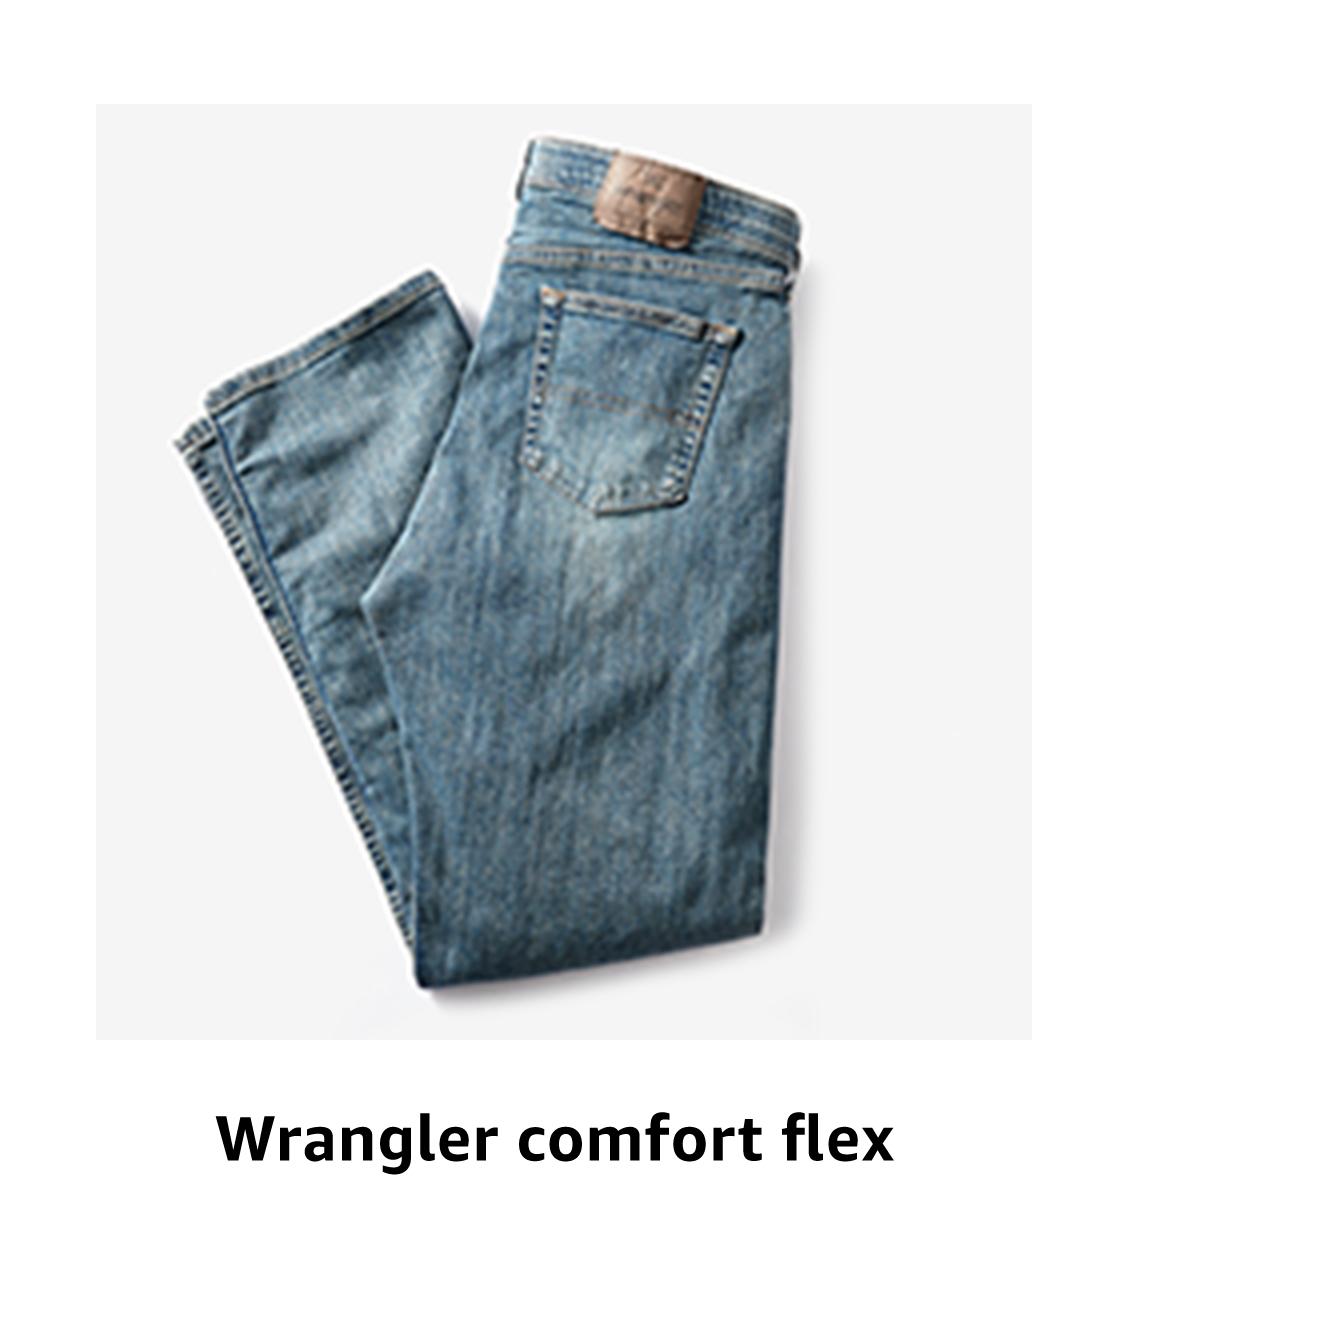 Wrangler comfort flex